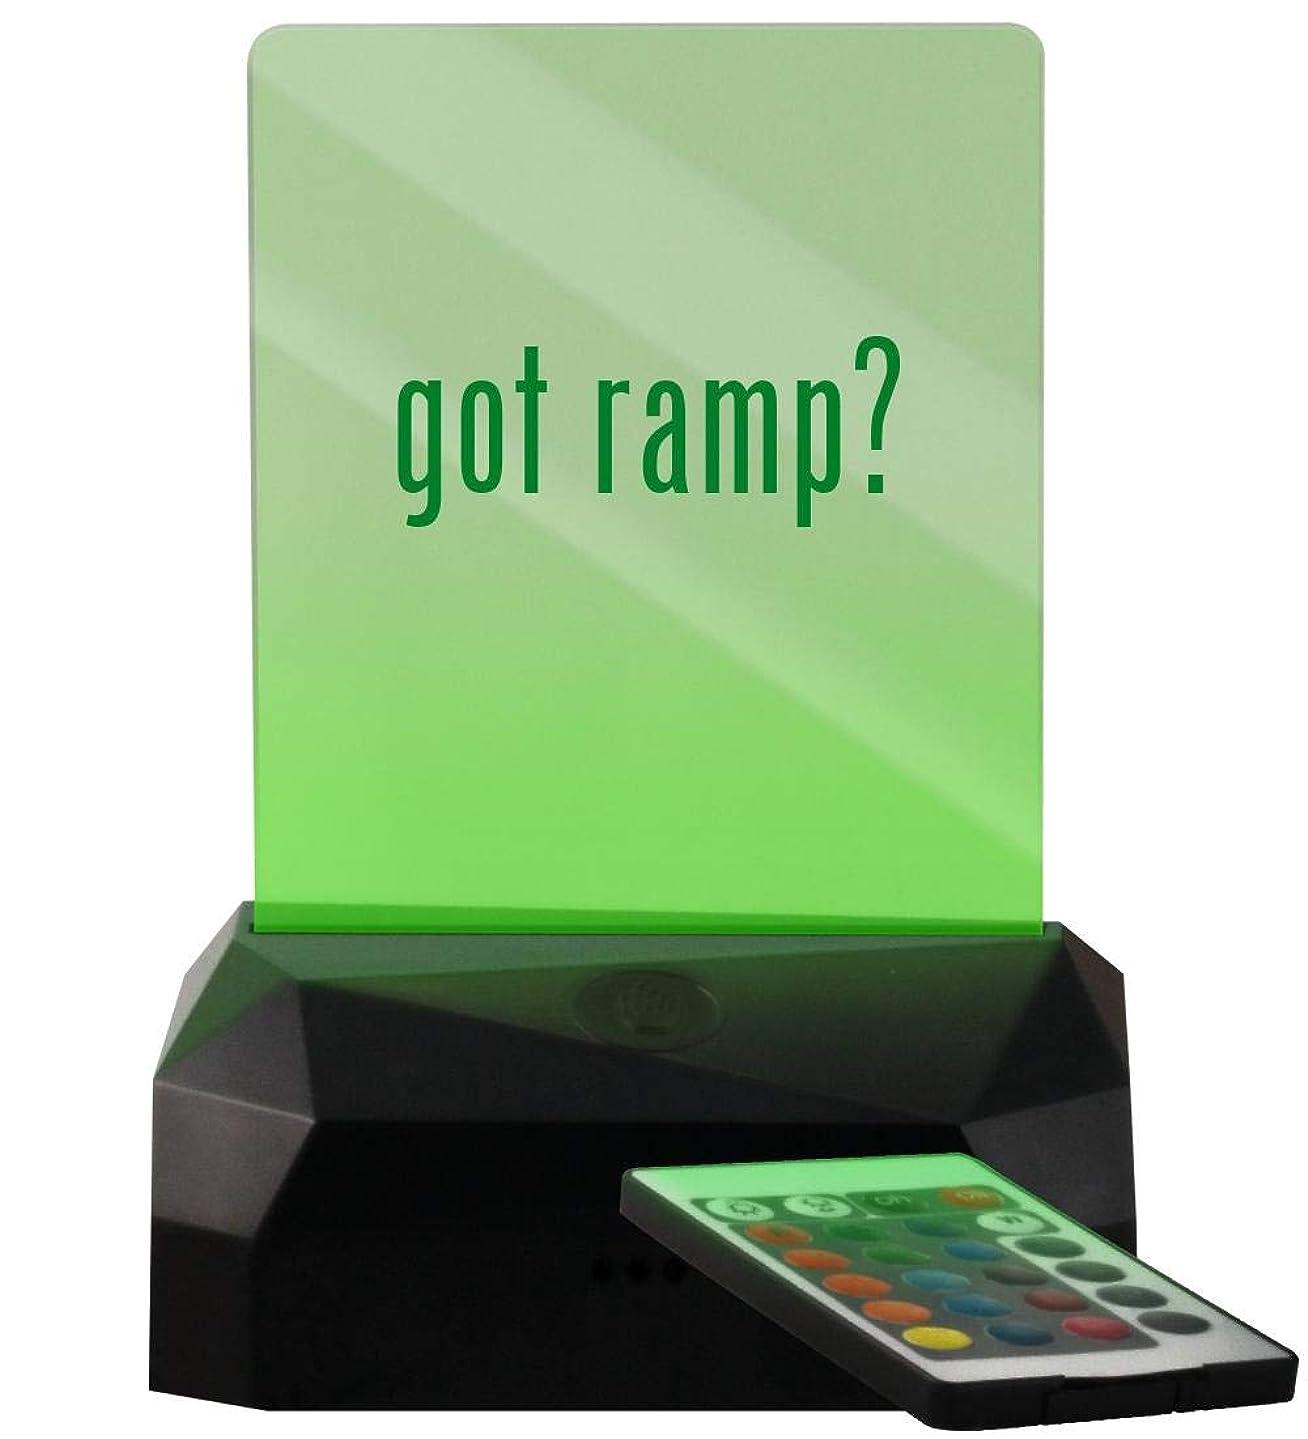 got ramp? - LED USB Rechargeable Edge Lit Sign eniqe54375846831